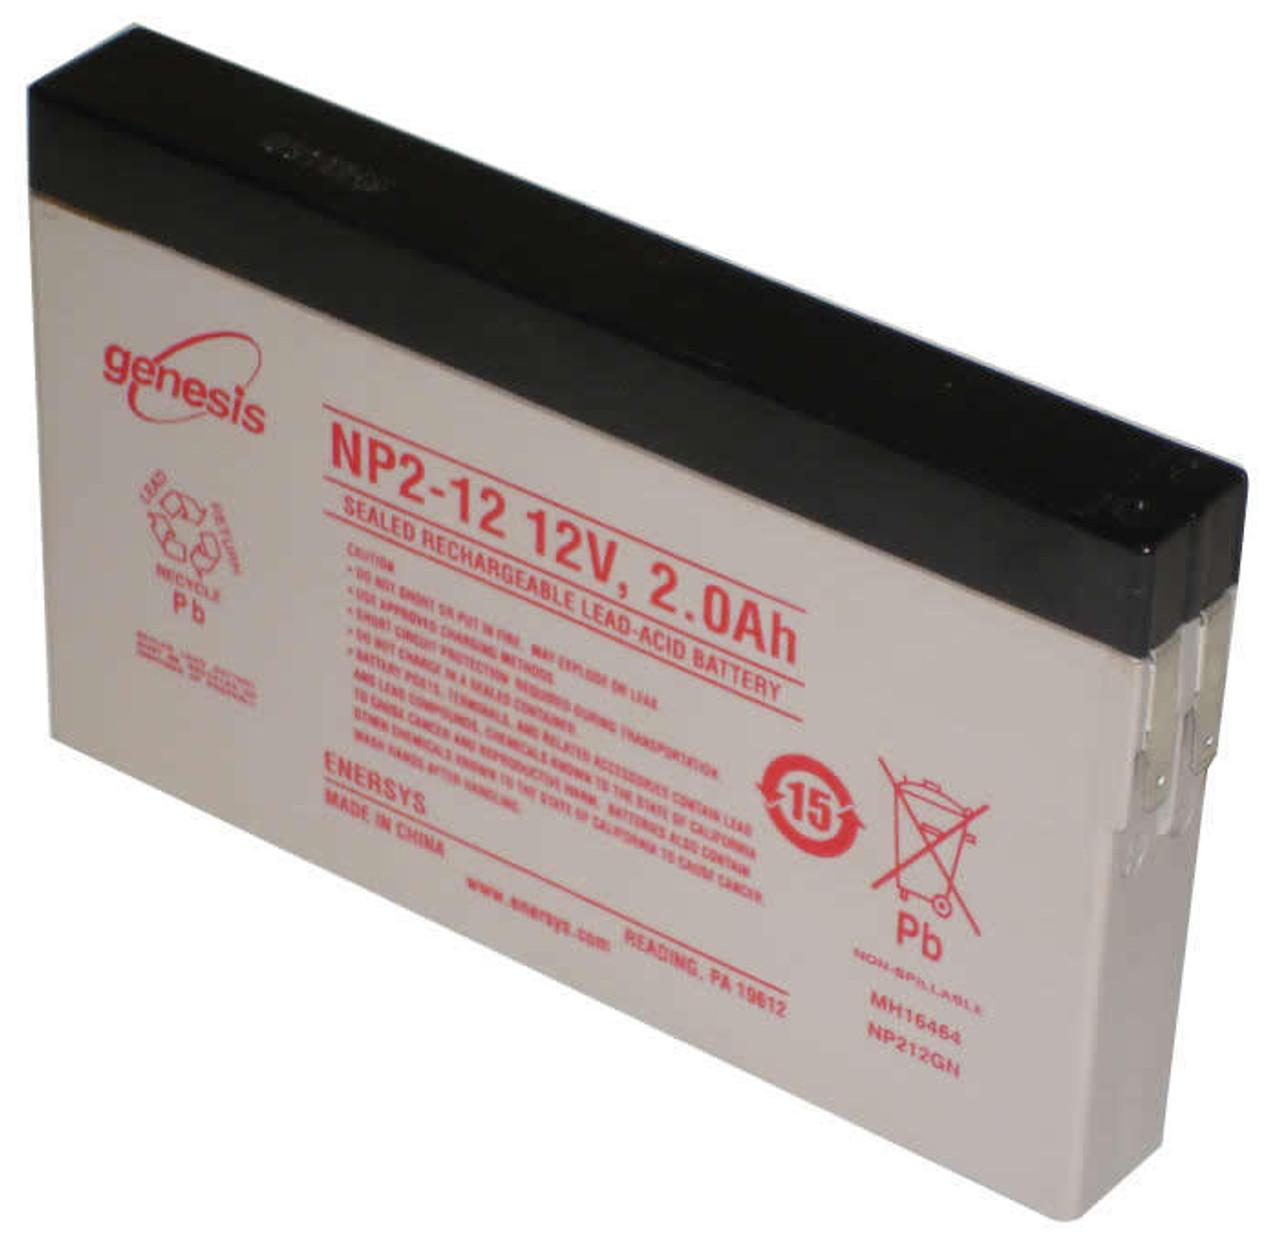 NP2-12 Sealed Lead Battery 12v 2.0ah Enersys Genesis  (side terminals)